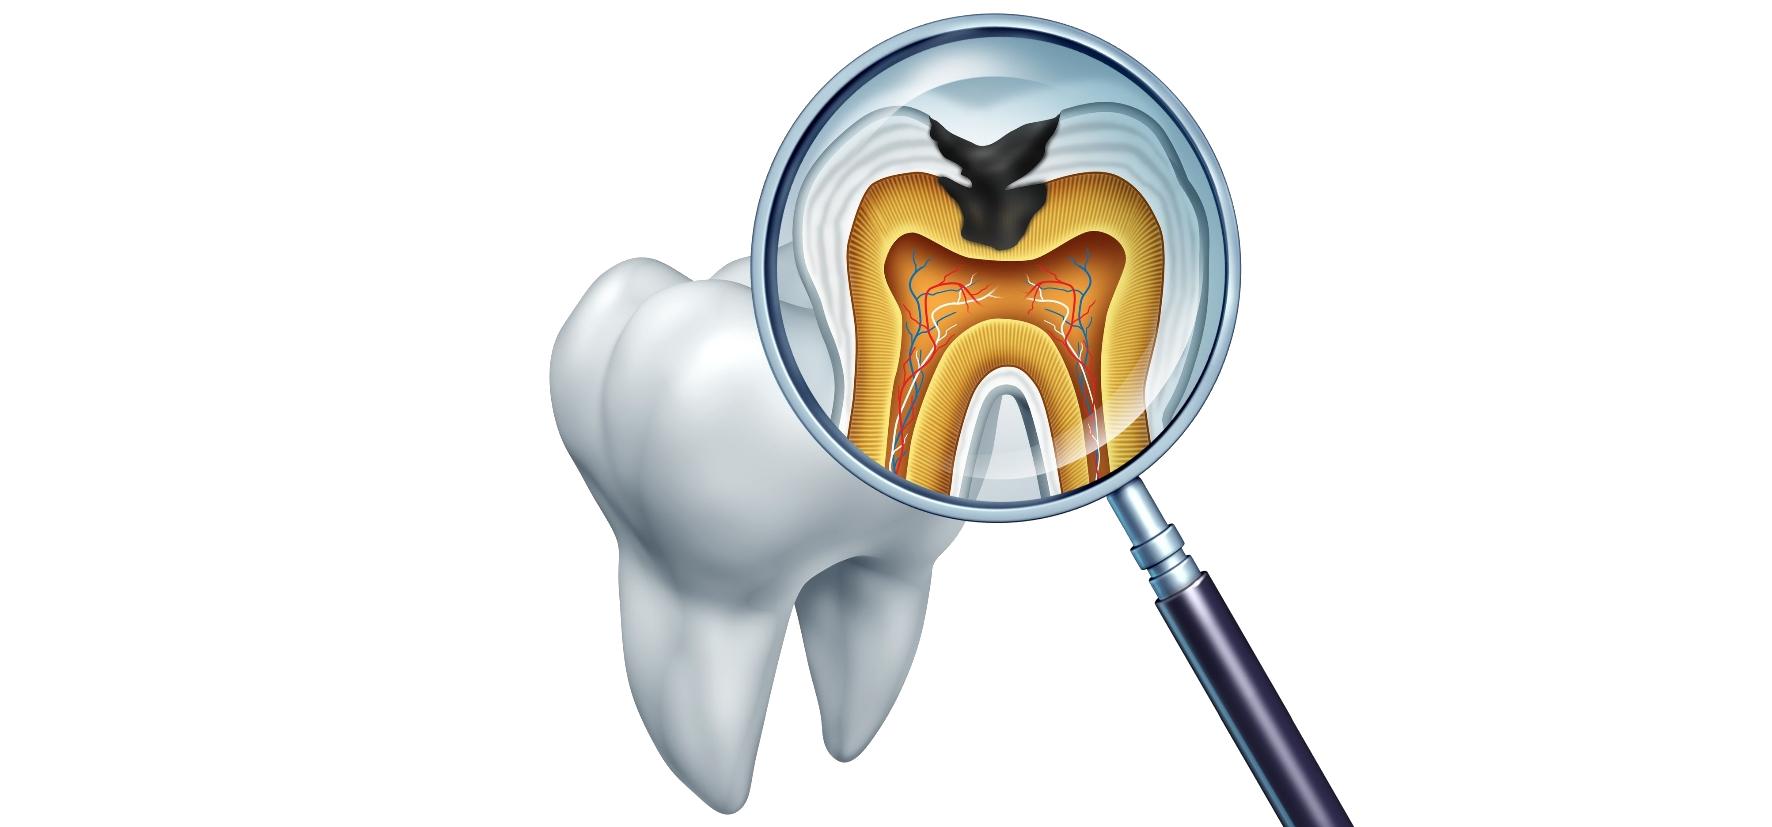 Karies: Ursachen, Vorbeugung, Behandlung - Zahnarzt